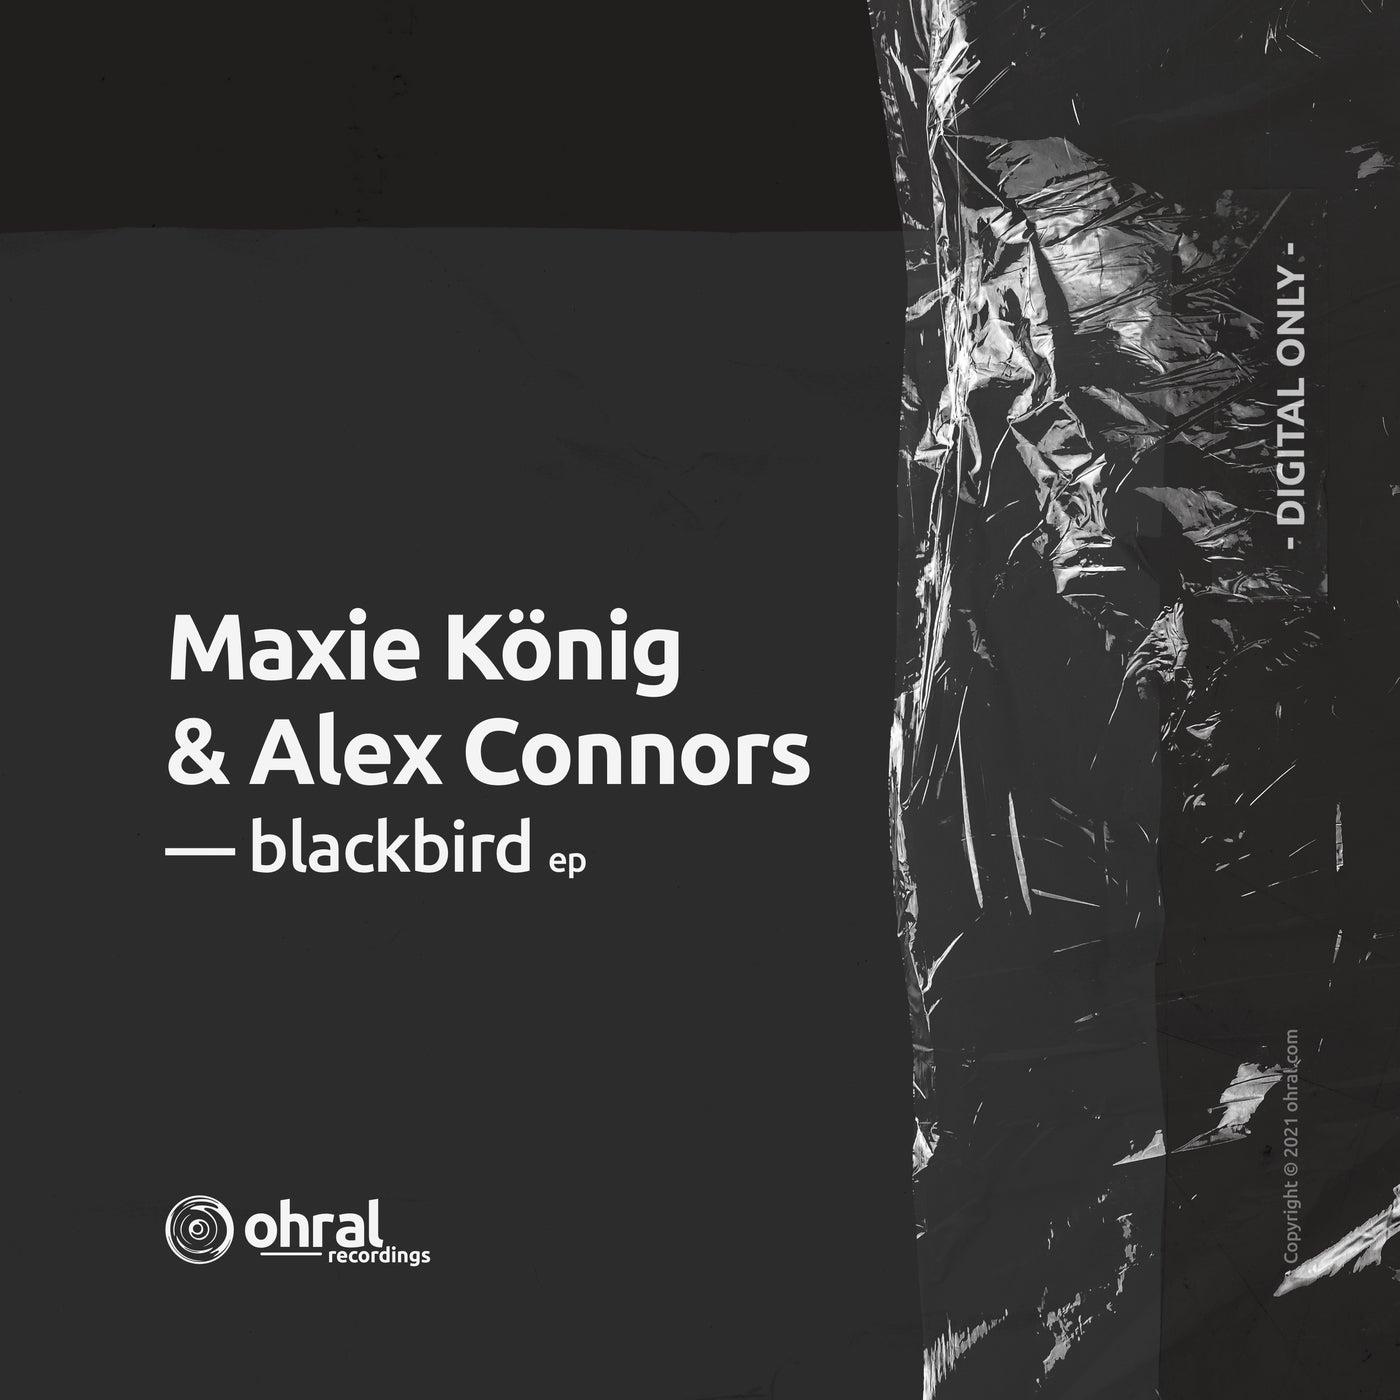 Blackbird (Ohral Extended Dub)